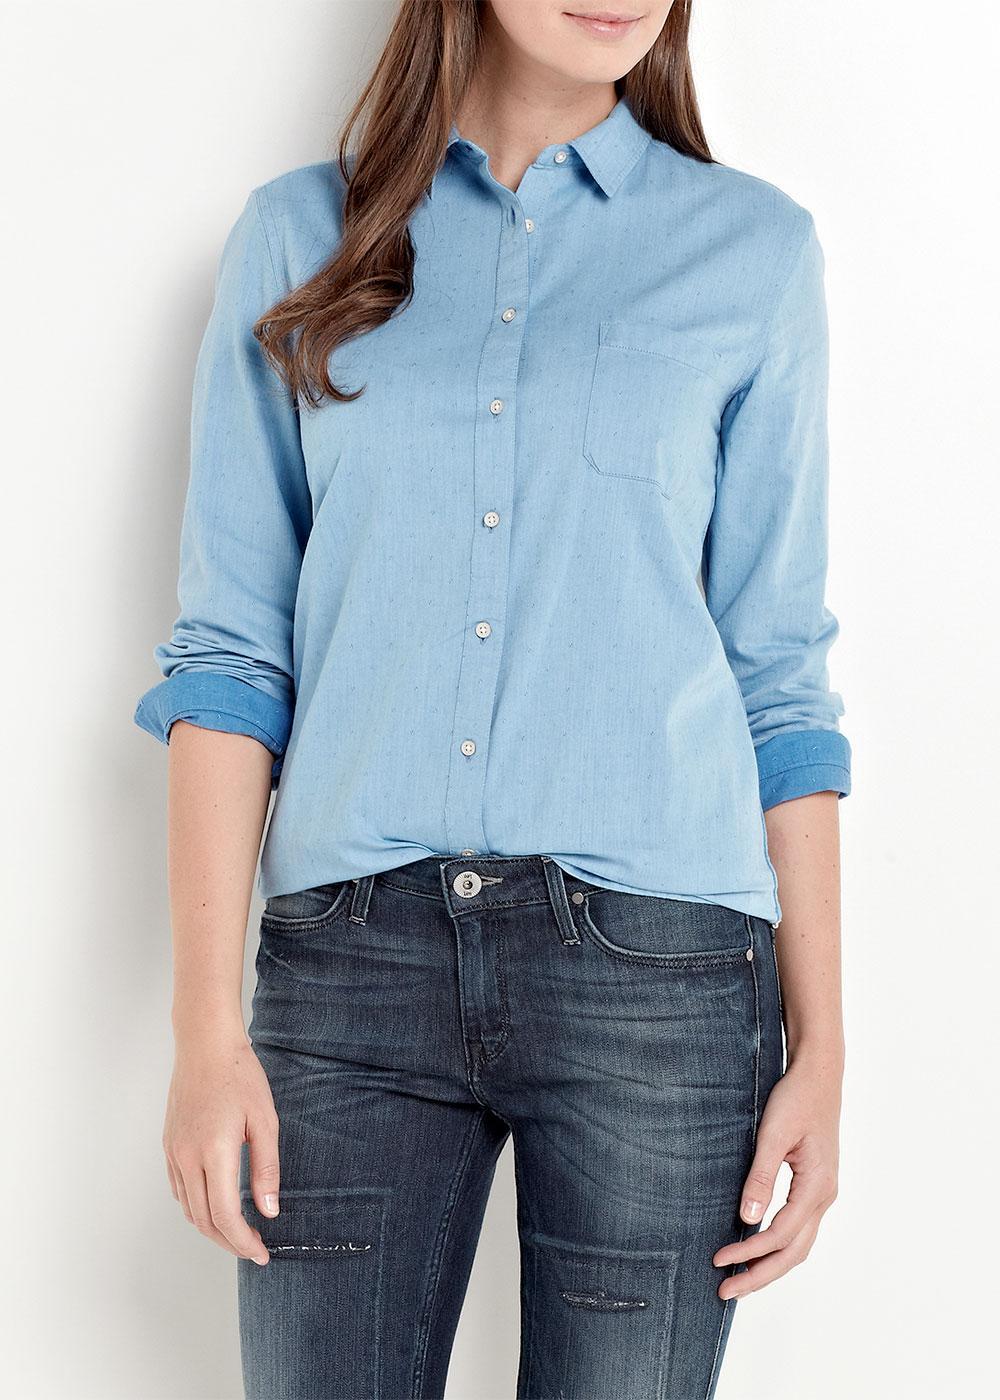 LEE JEANS Retro 60s Jaquard Dobby Shirt (Blue Ice)